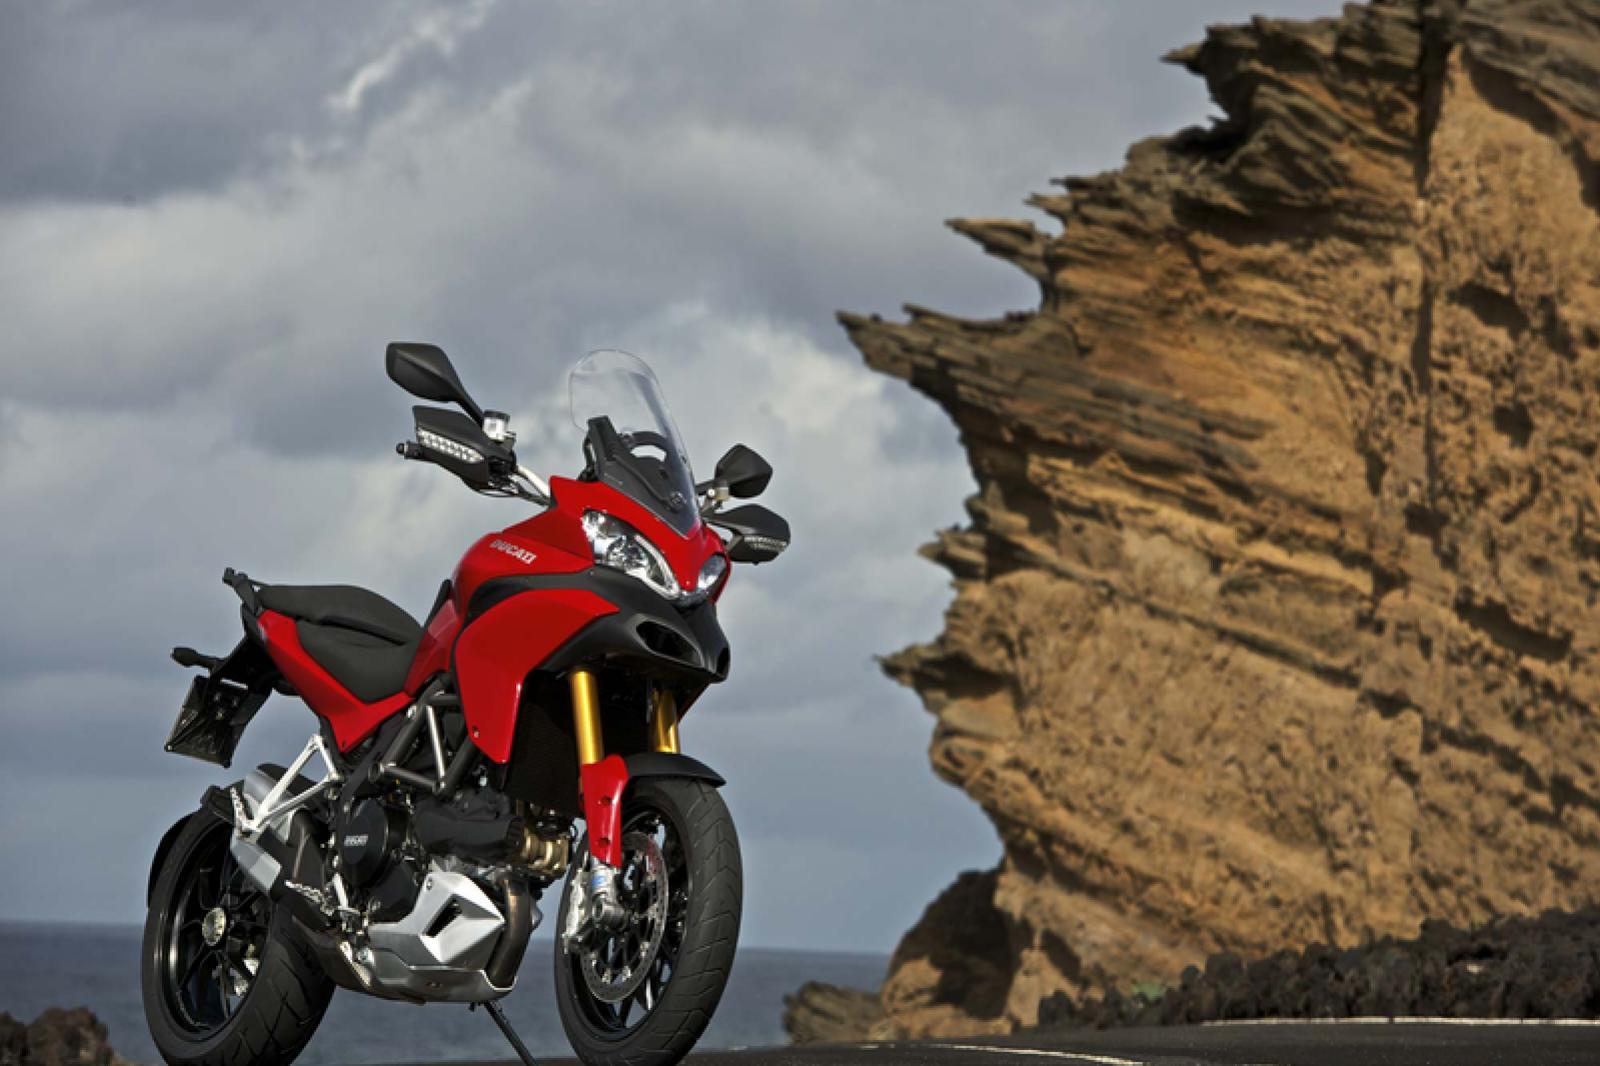 Обои Мотоцикл, просто монстр, хром. Мотоциклы foto 3